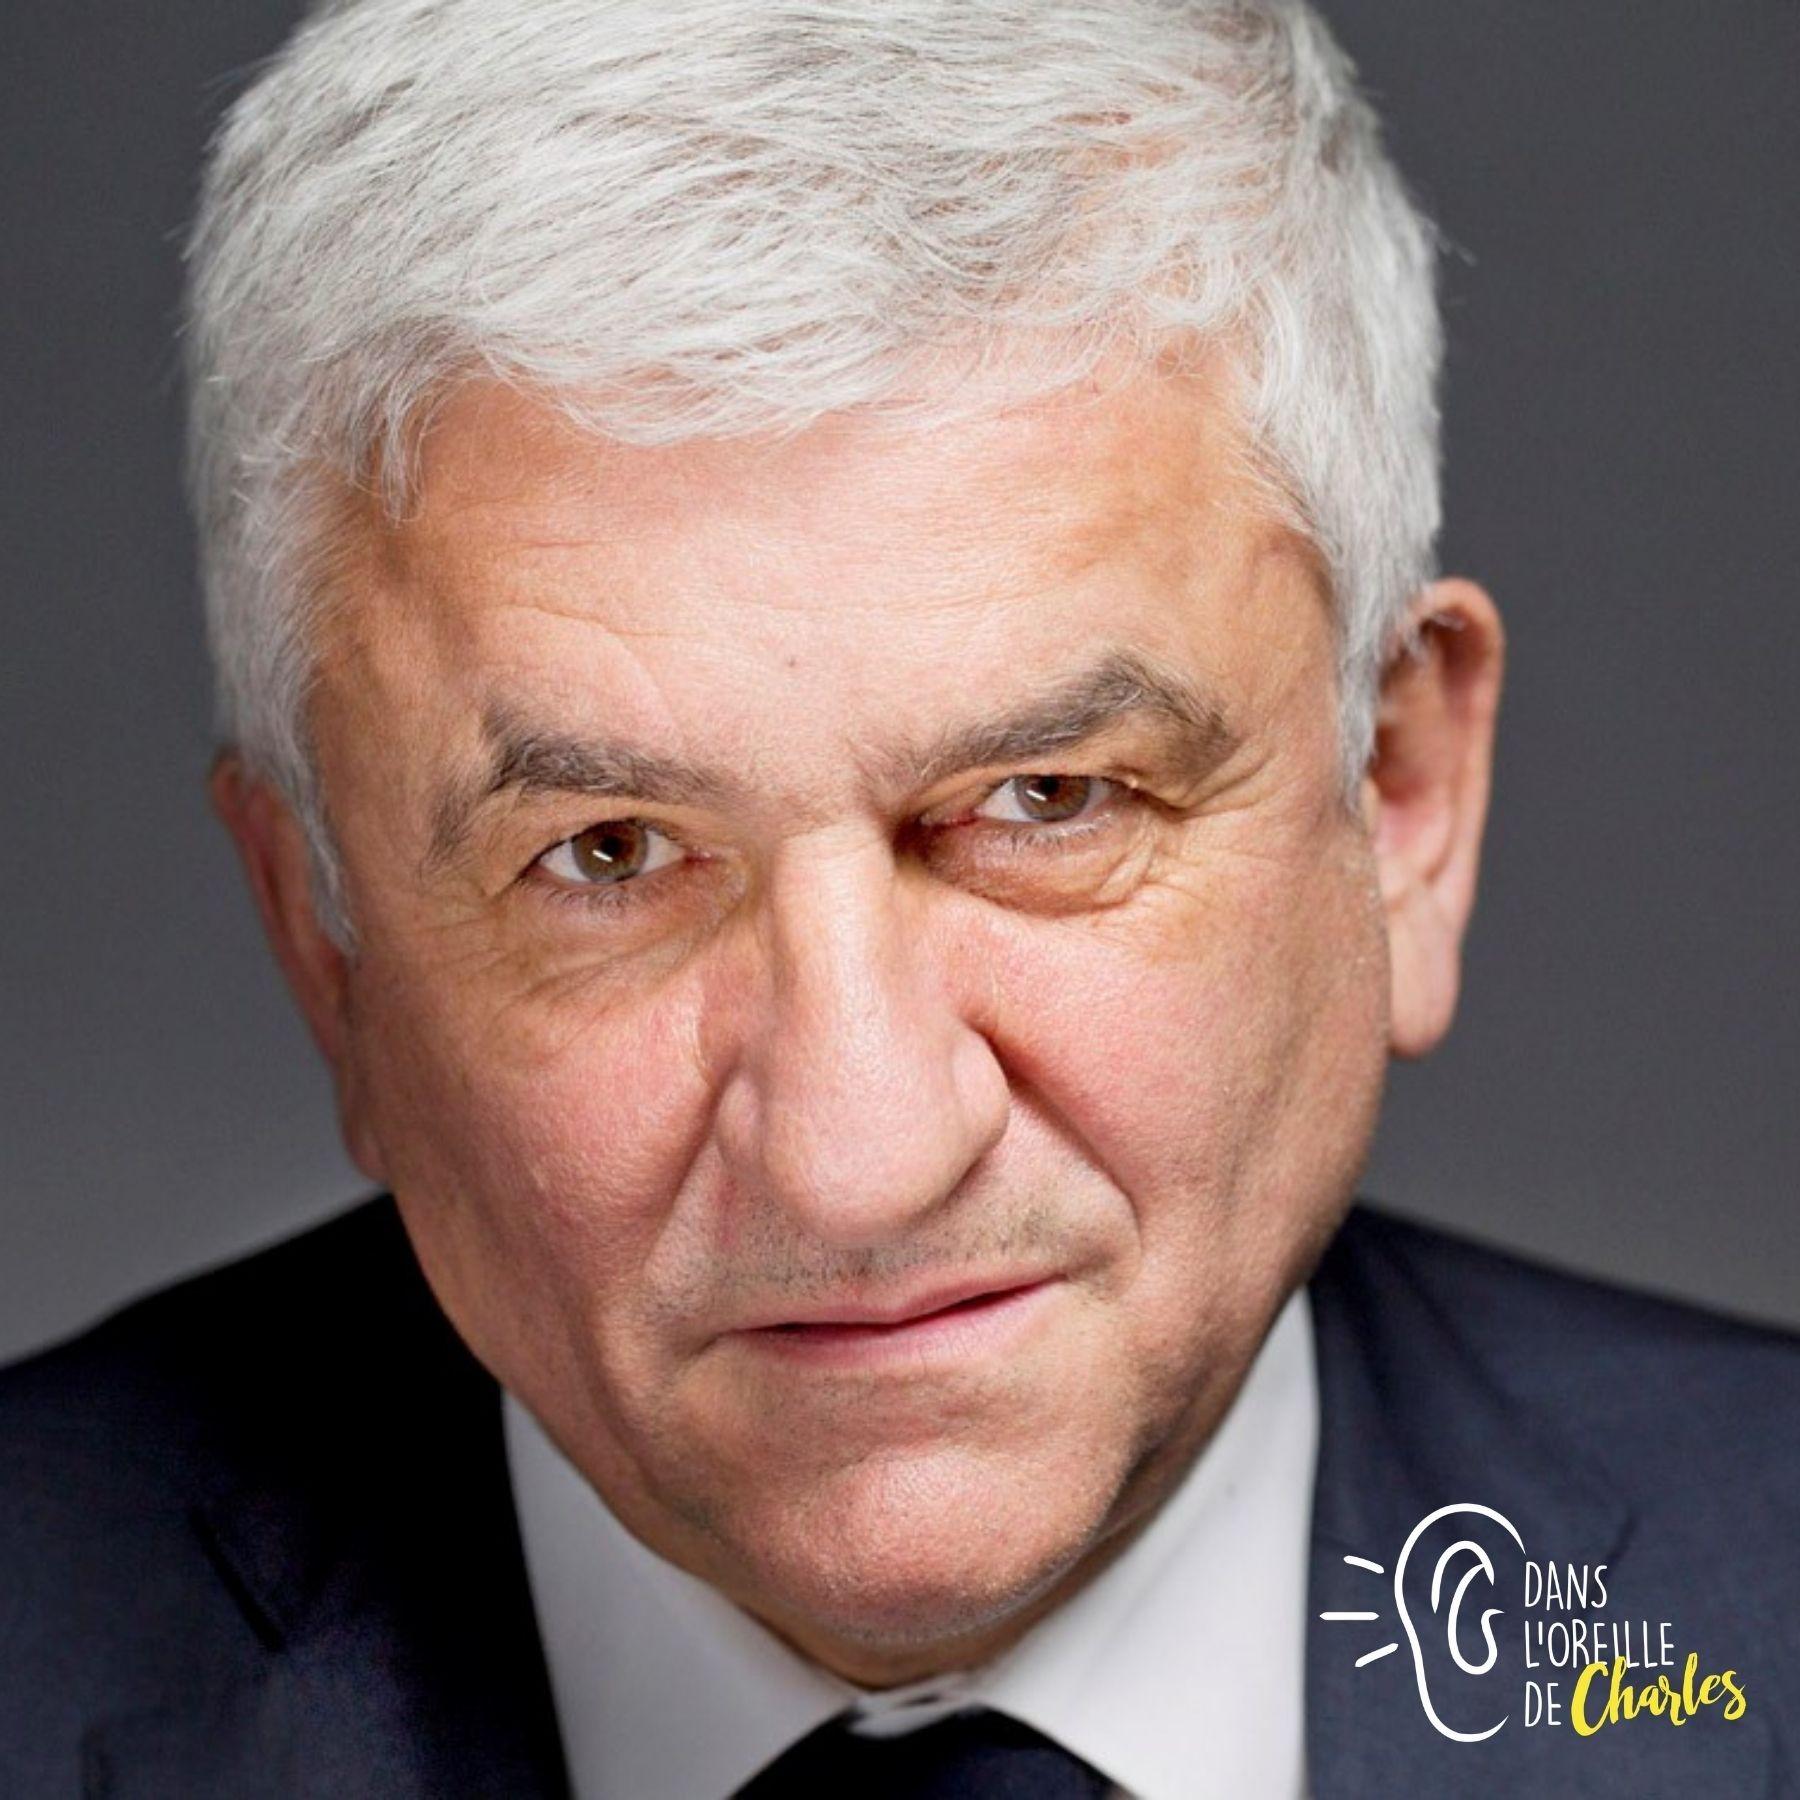 Les grands barons - Hervé Morin